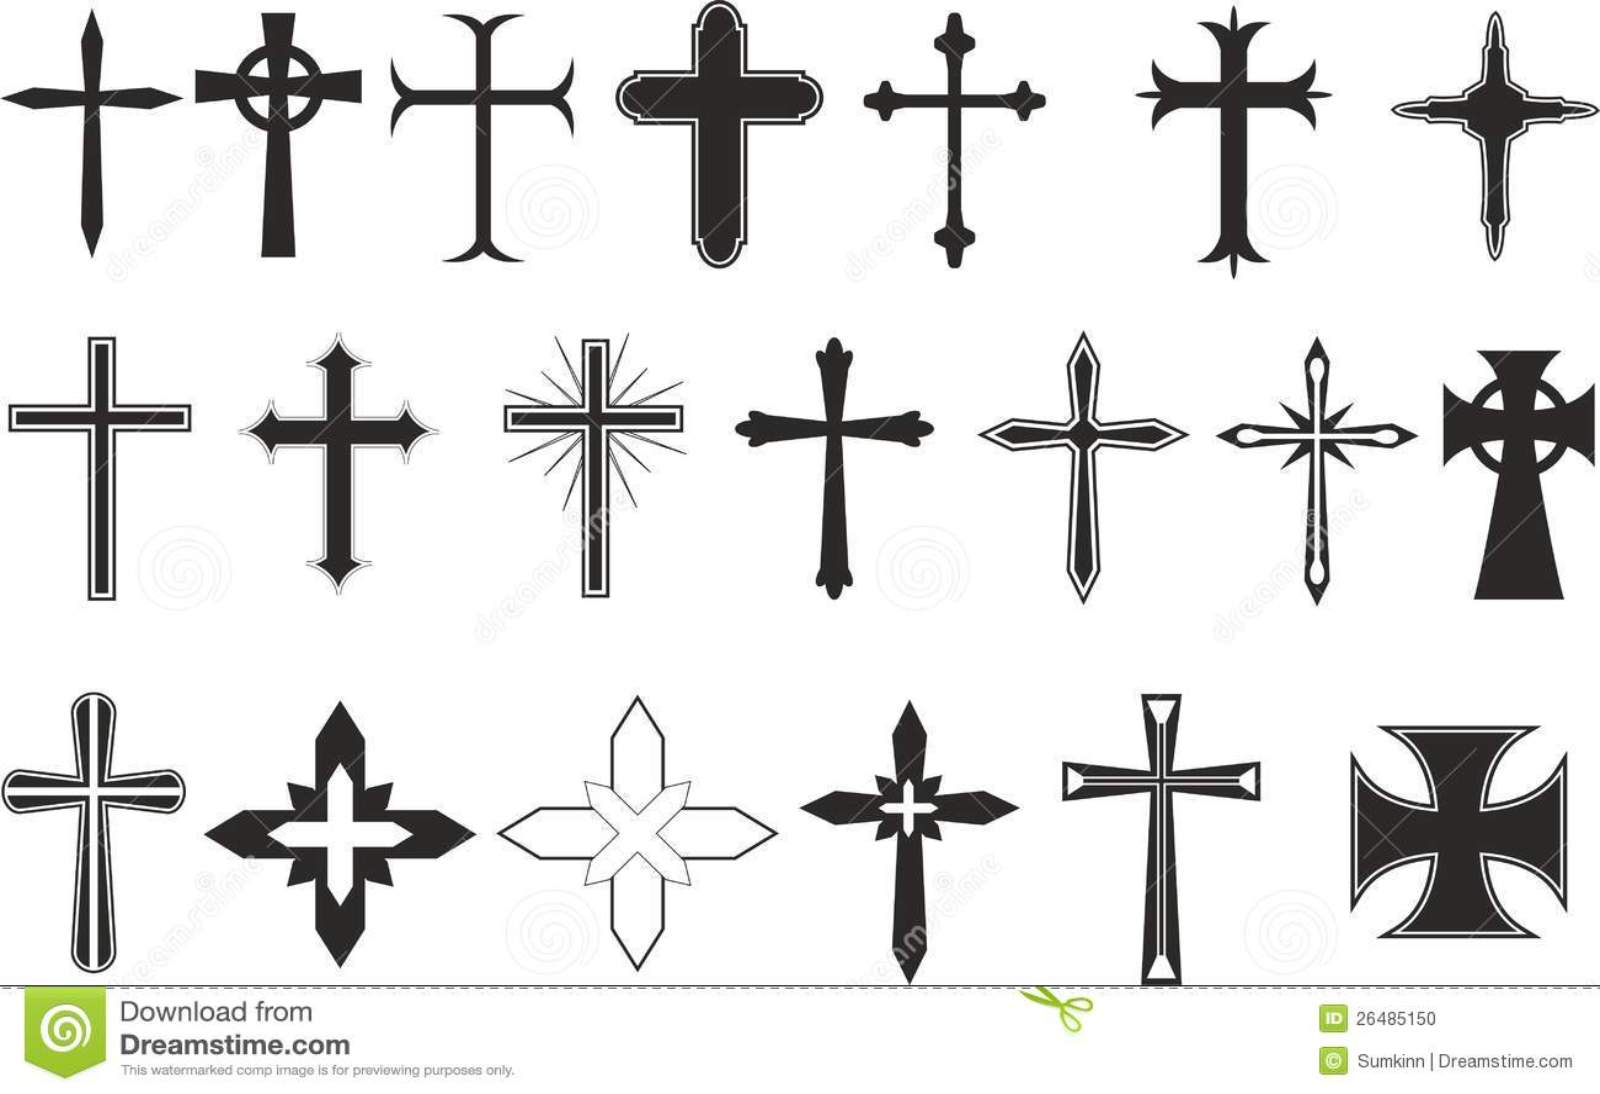 Cross Symbols Stock Photo Image 26485150